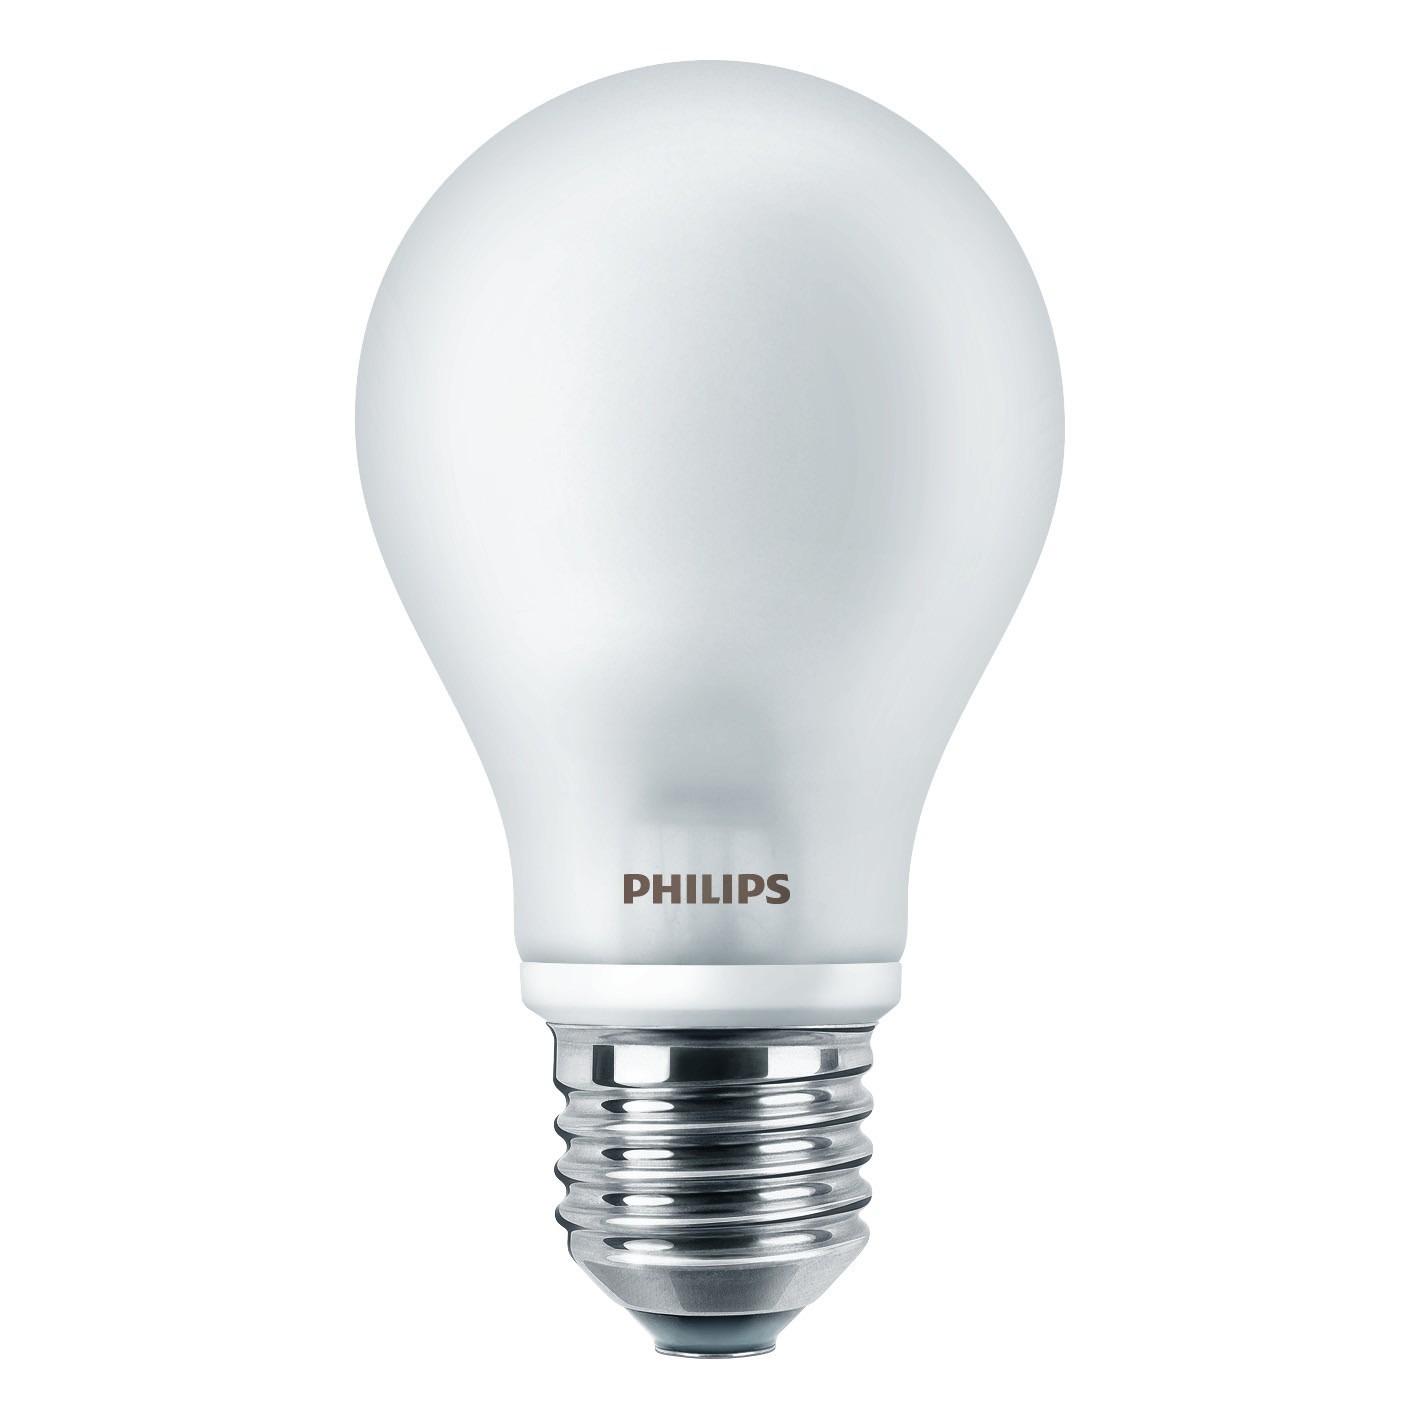 Philips LEDclassic Birne 4,5 Watt 470 Lumen warmweiß A++